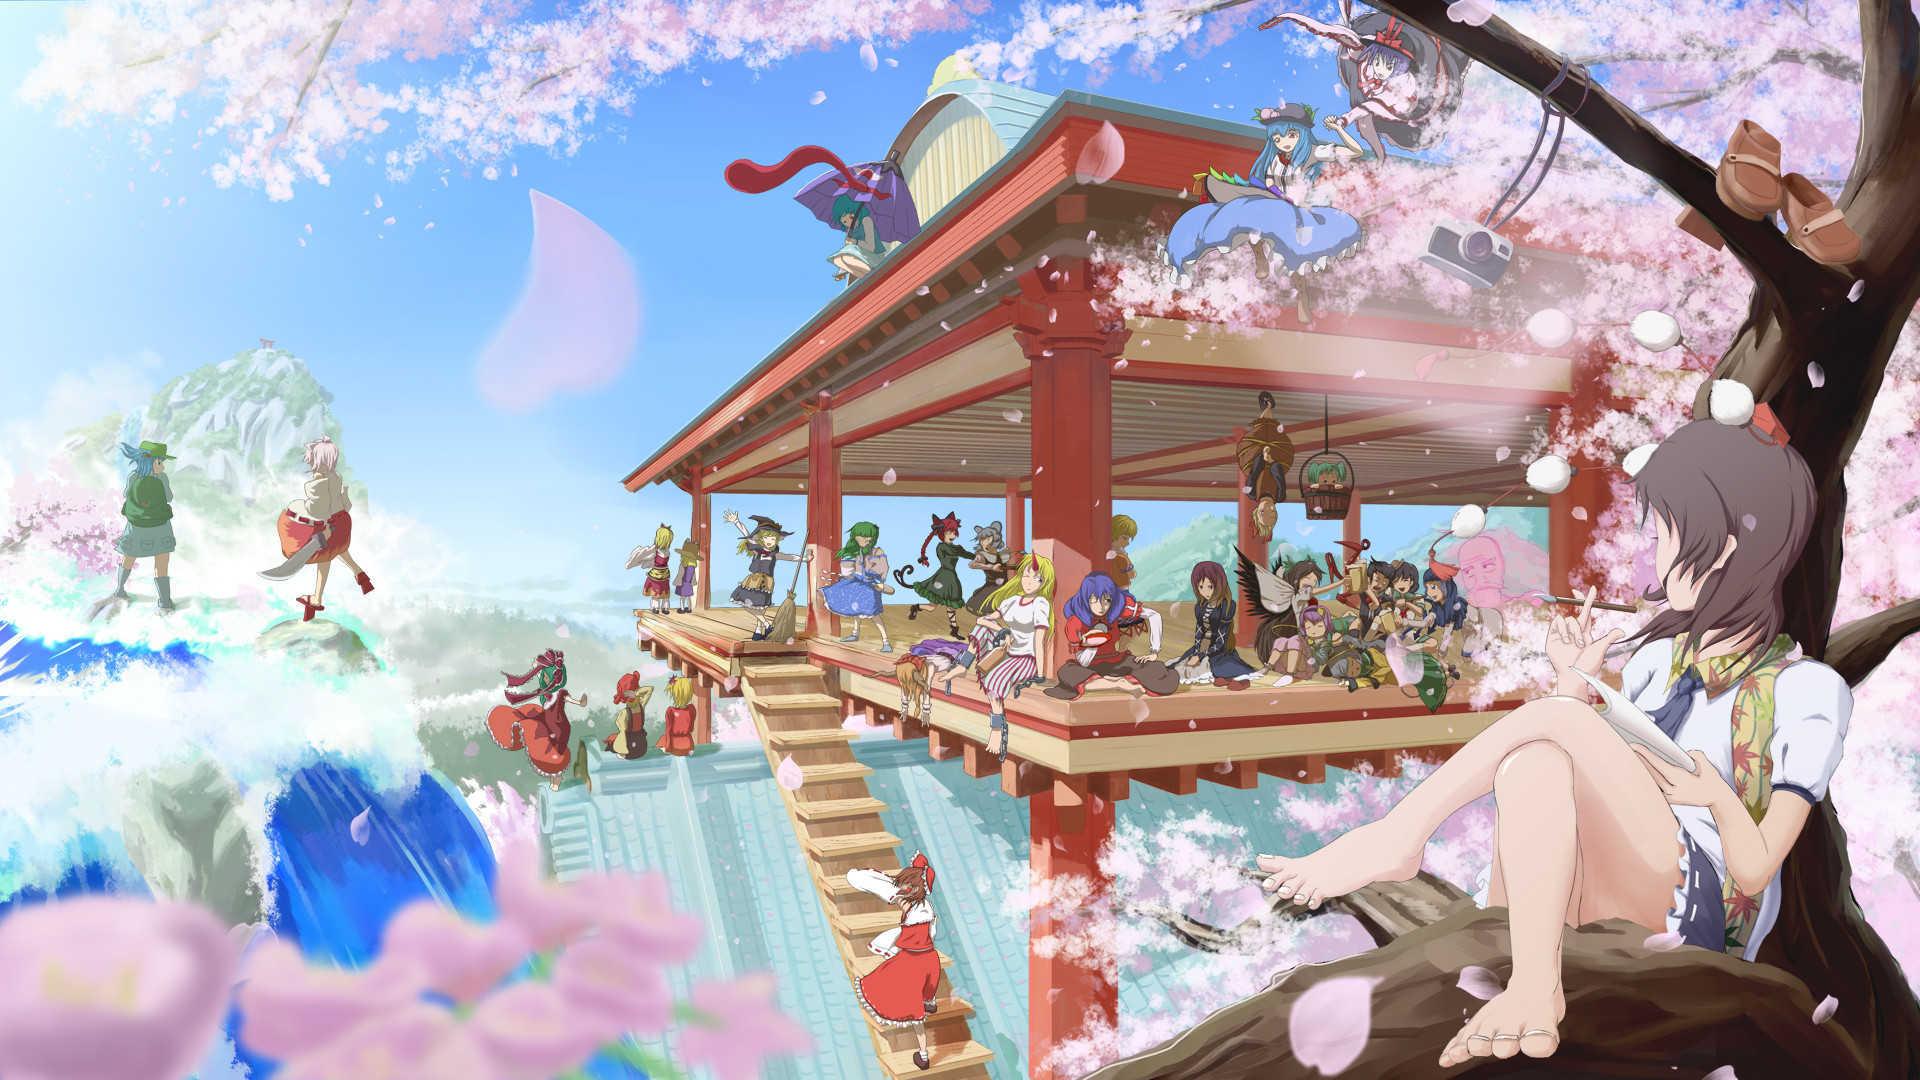 Blue Touhou Clouds Unzan Ichirin Skyscapes Kumoi